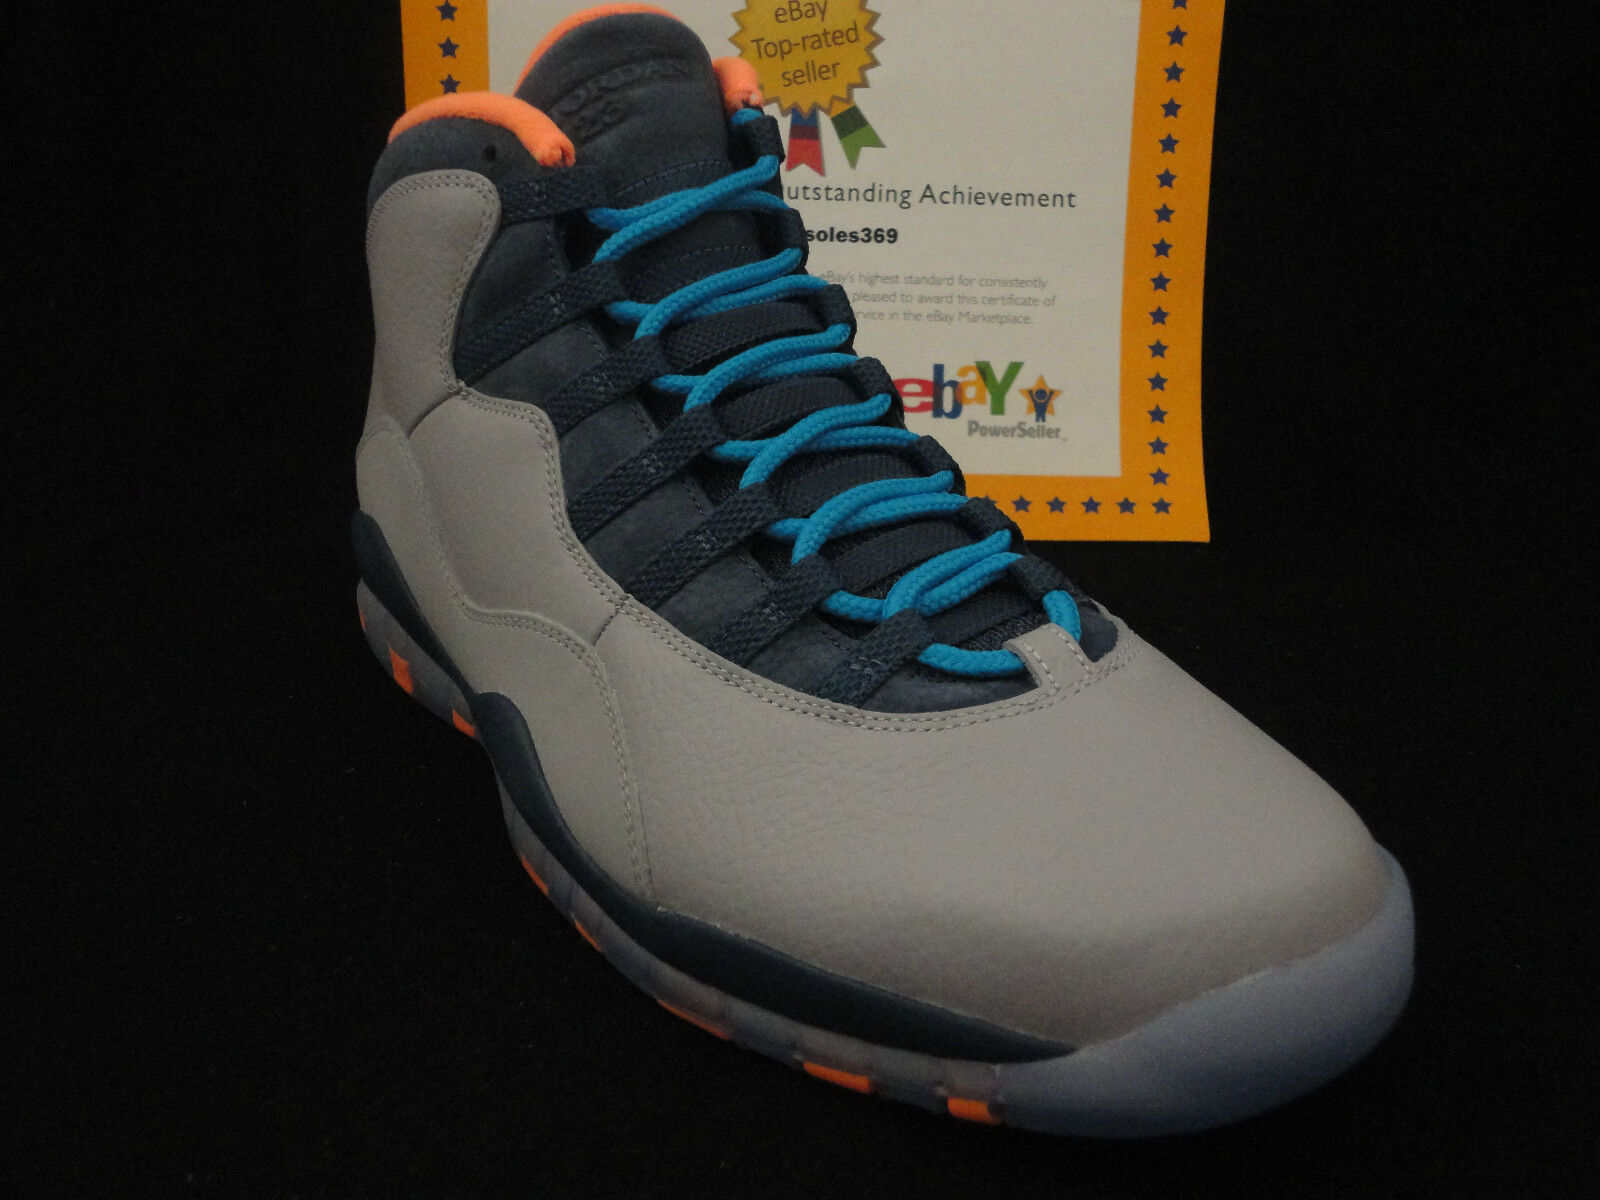 new product a072d a391f ... Nike Nike Nike Air Jordan Retro 10 X, Bobcats, Size 10 bd7254 ...